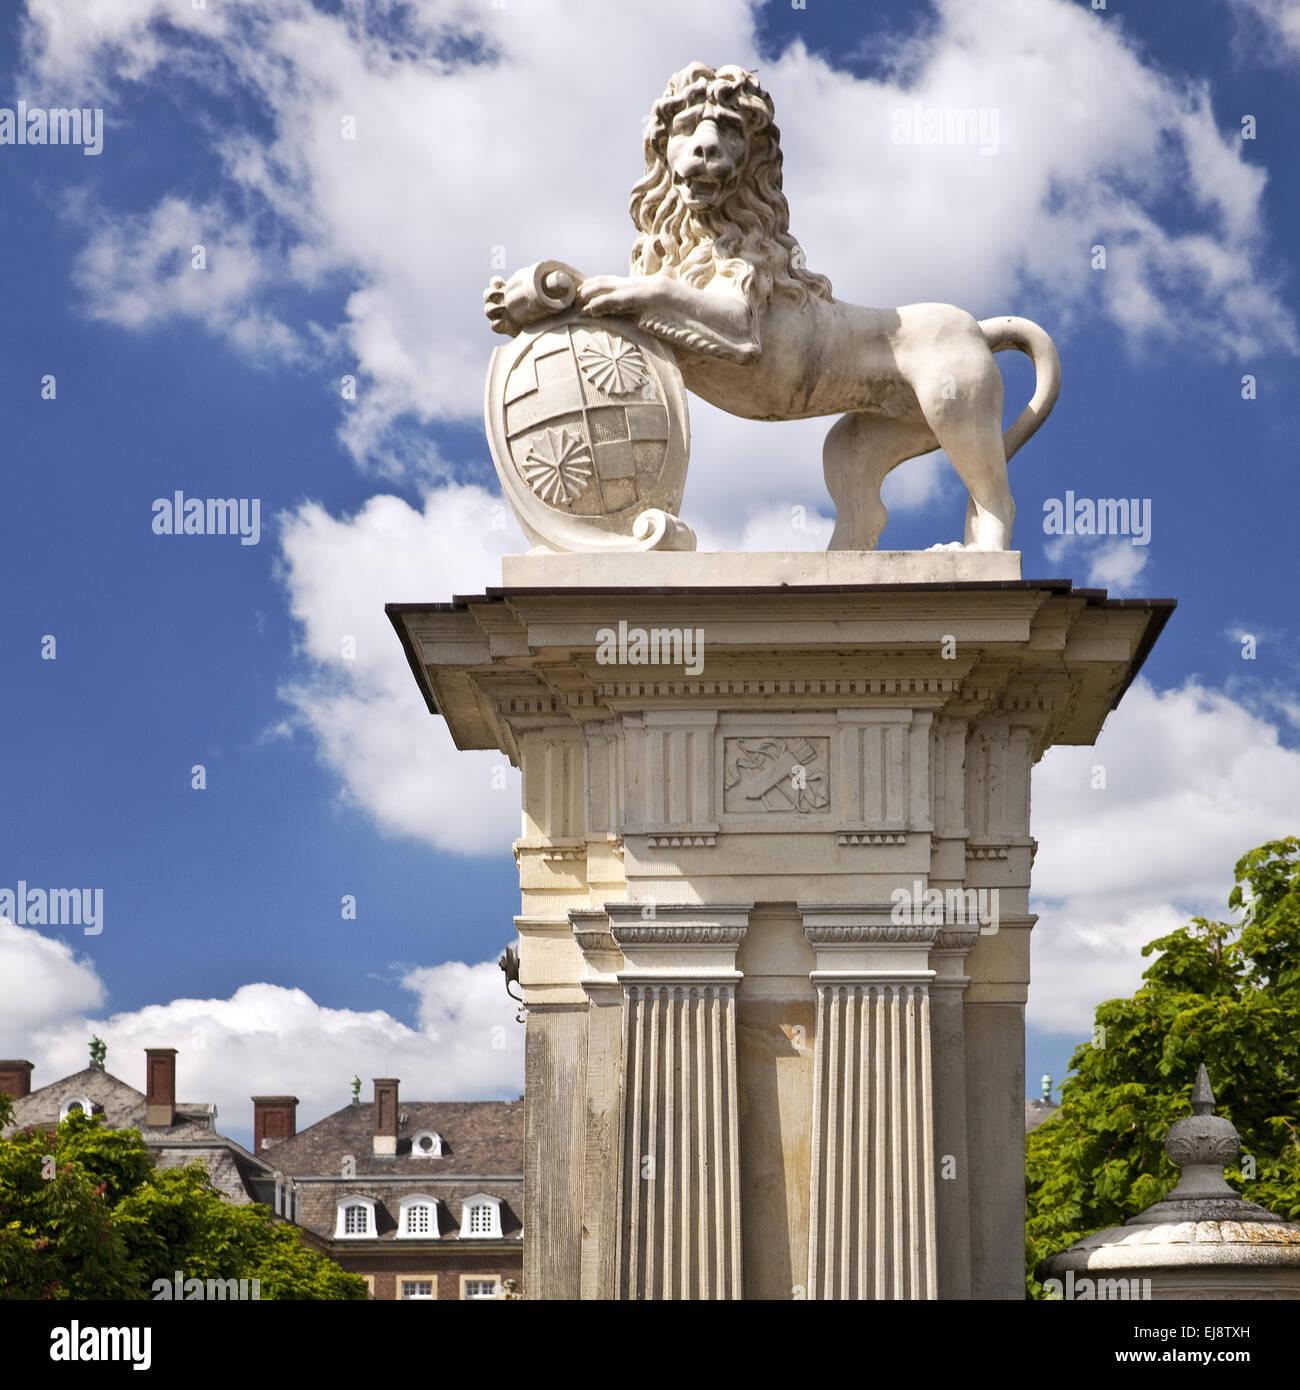 Lion sculpture, Nordkirchen Palace, Germany - Stock Image